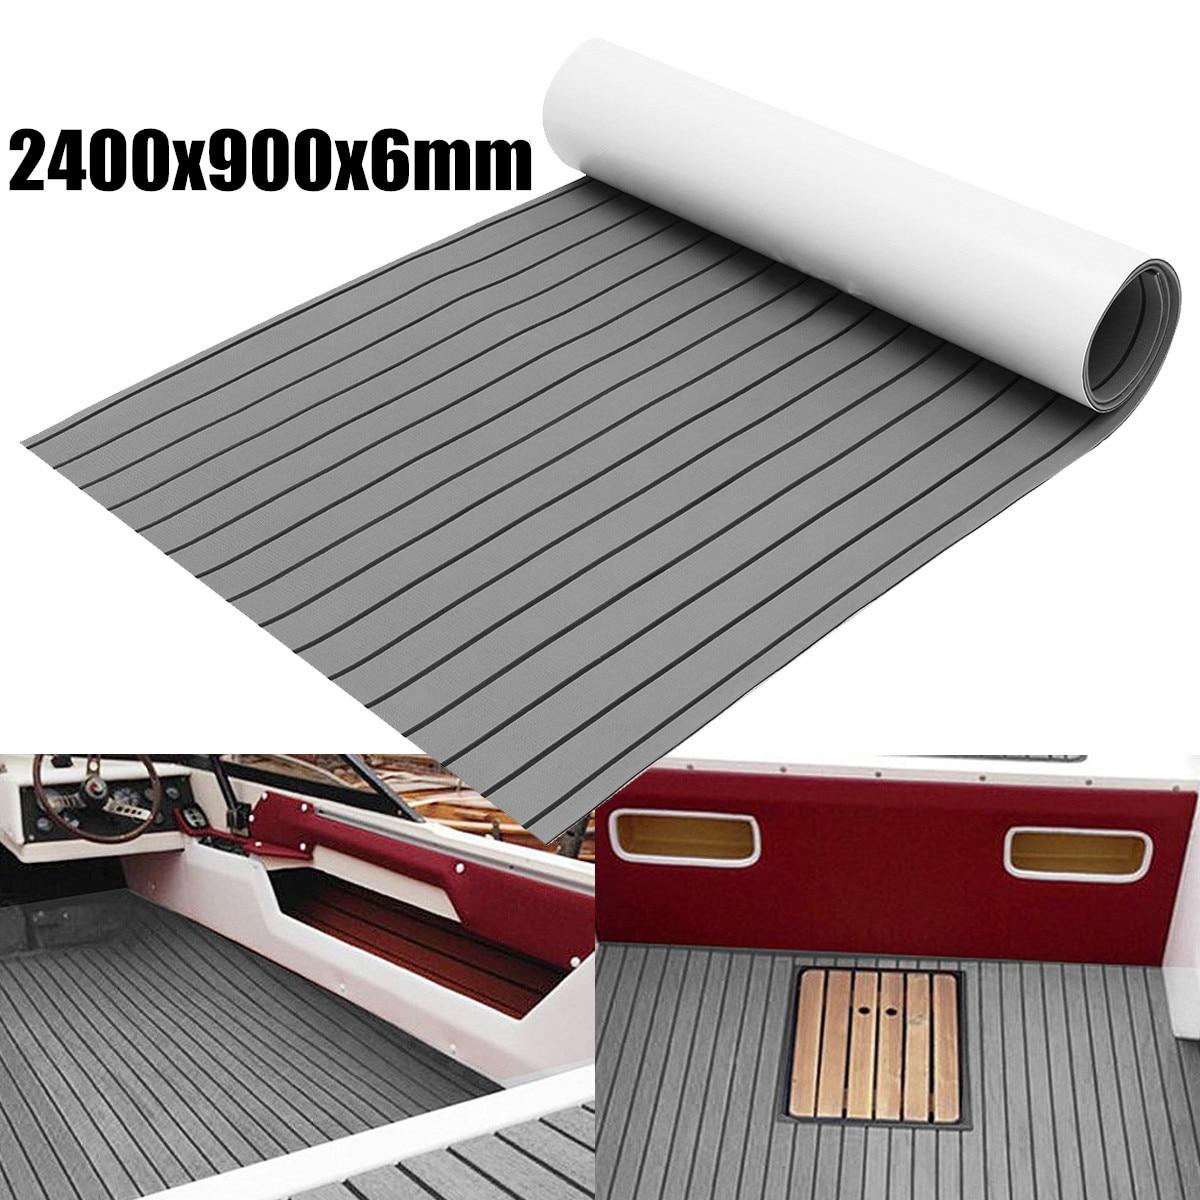 1Roll Self-Adhesive 2400x900x6mm Marine Flooring Faux Teak EVA Foam Boat Decking Sheet  Accessories Floor Mat Decor Gray Carpet